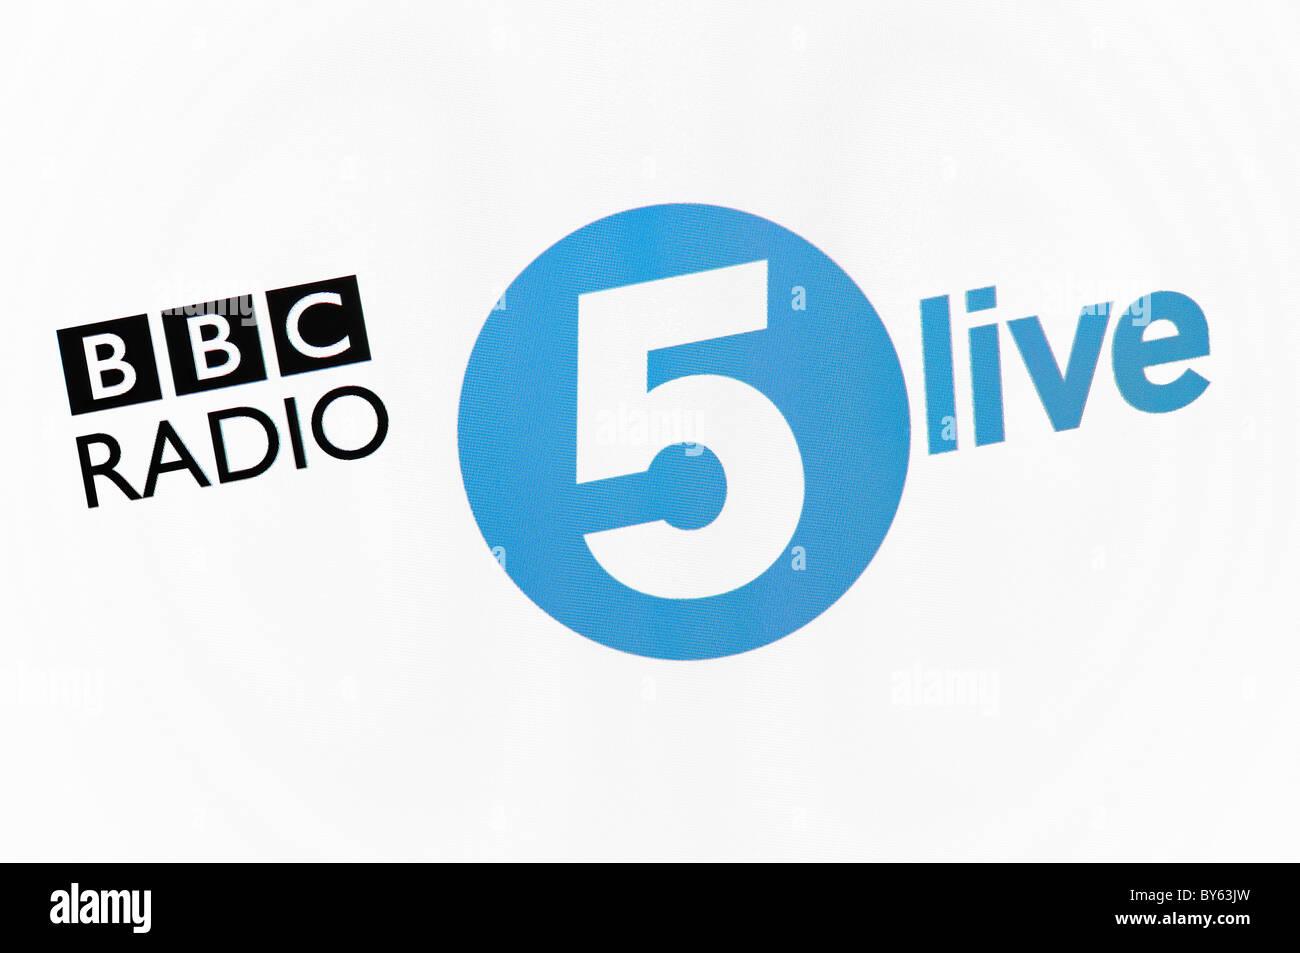 BBC Radio 5 Live Website Screenshot - Stock Image